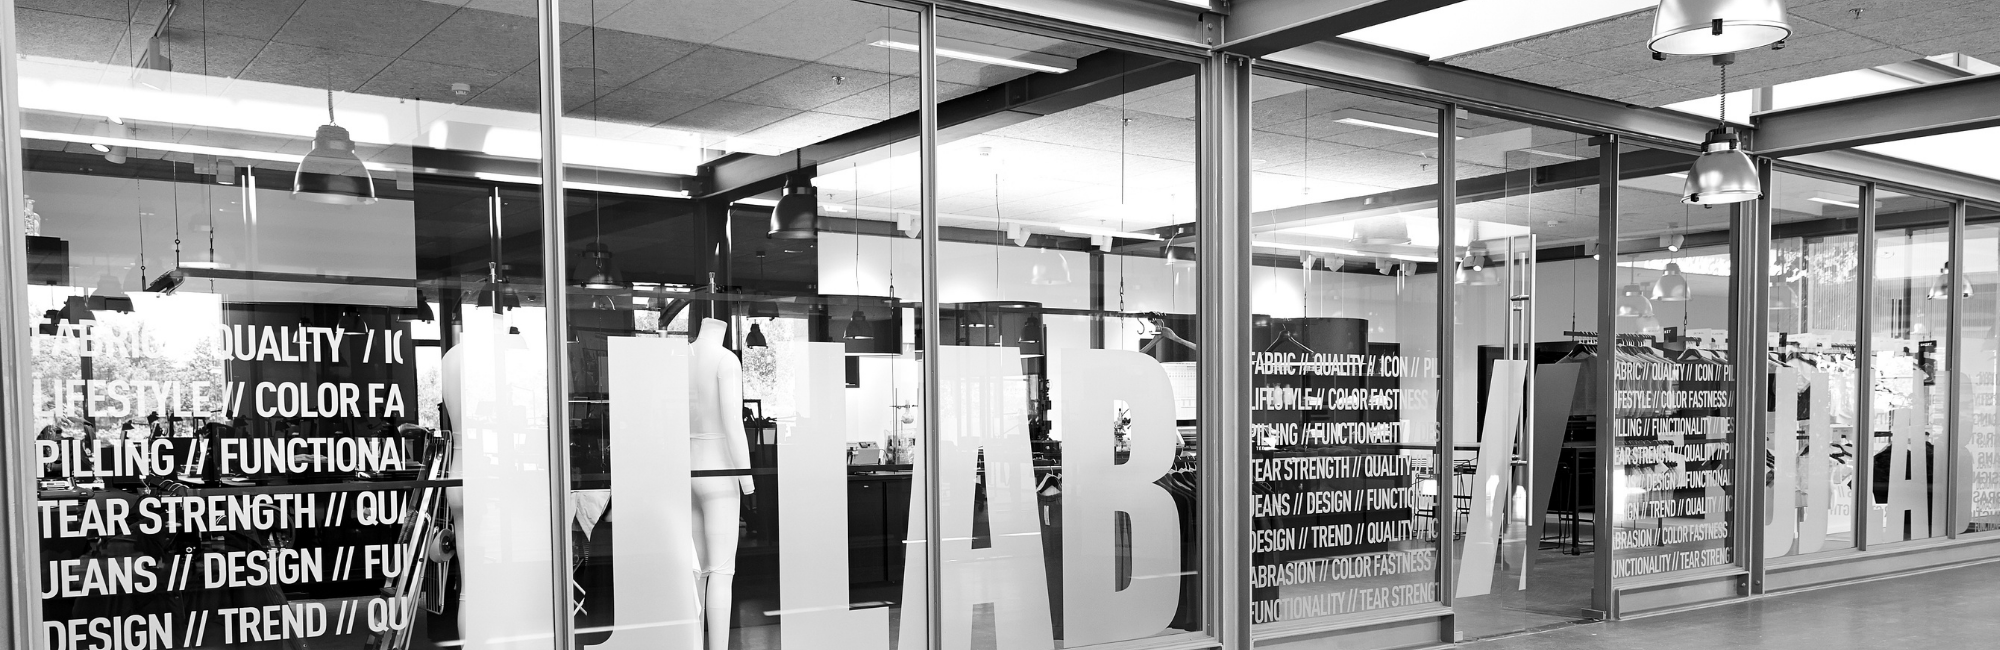 Jack&Jones lab in Denmark